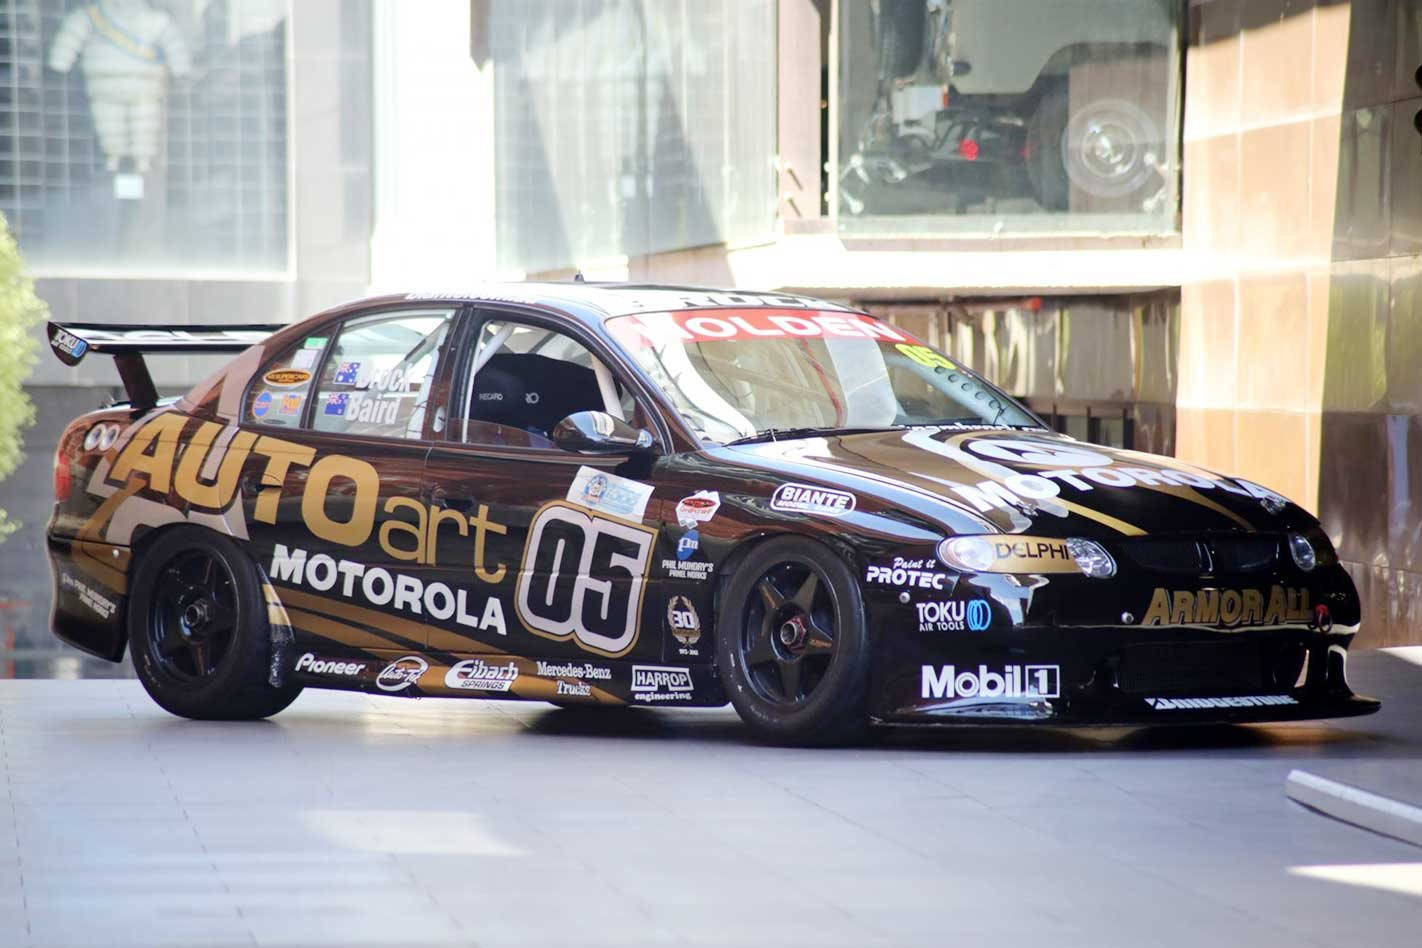 Peter Brock's Bathurst 1000 Holden VX Commodore Supercar for sale